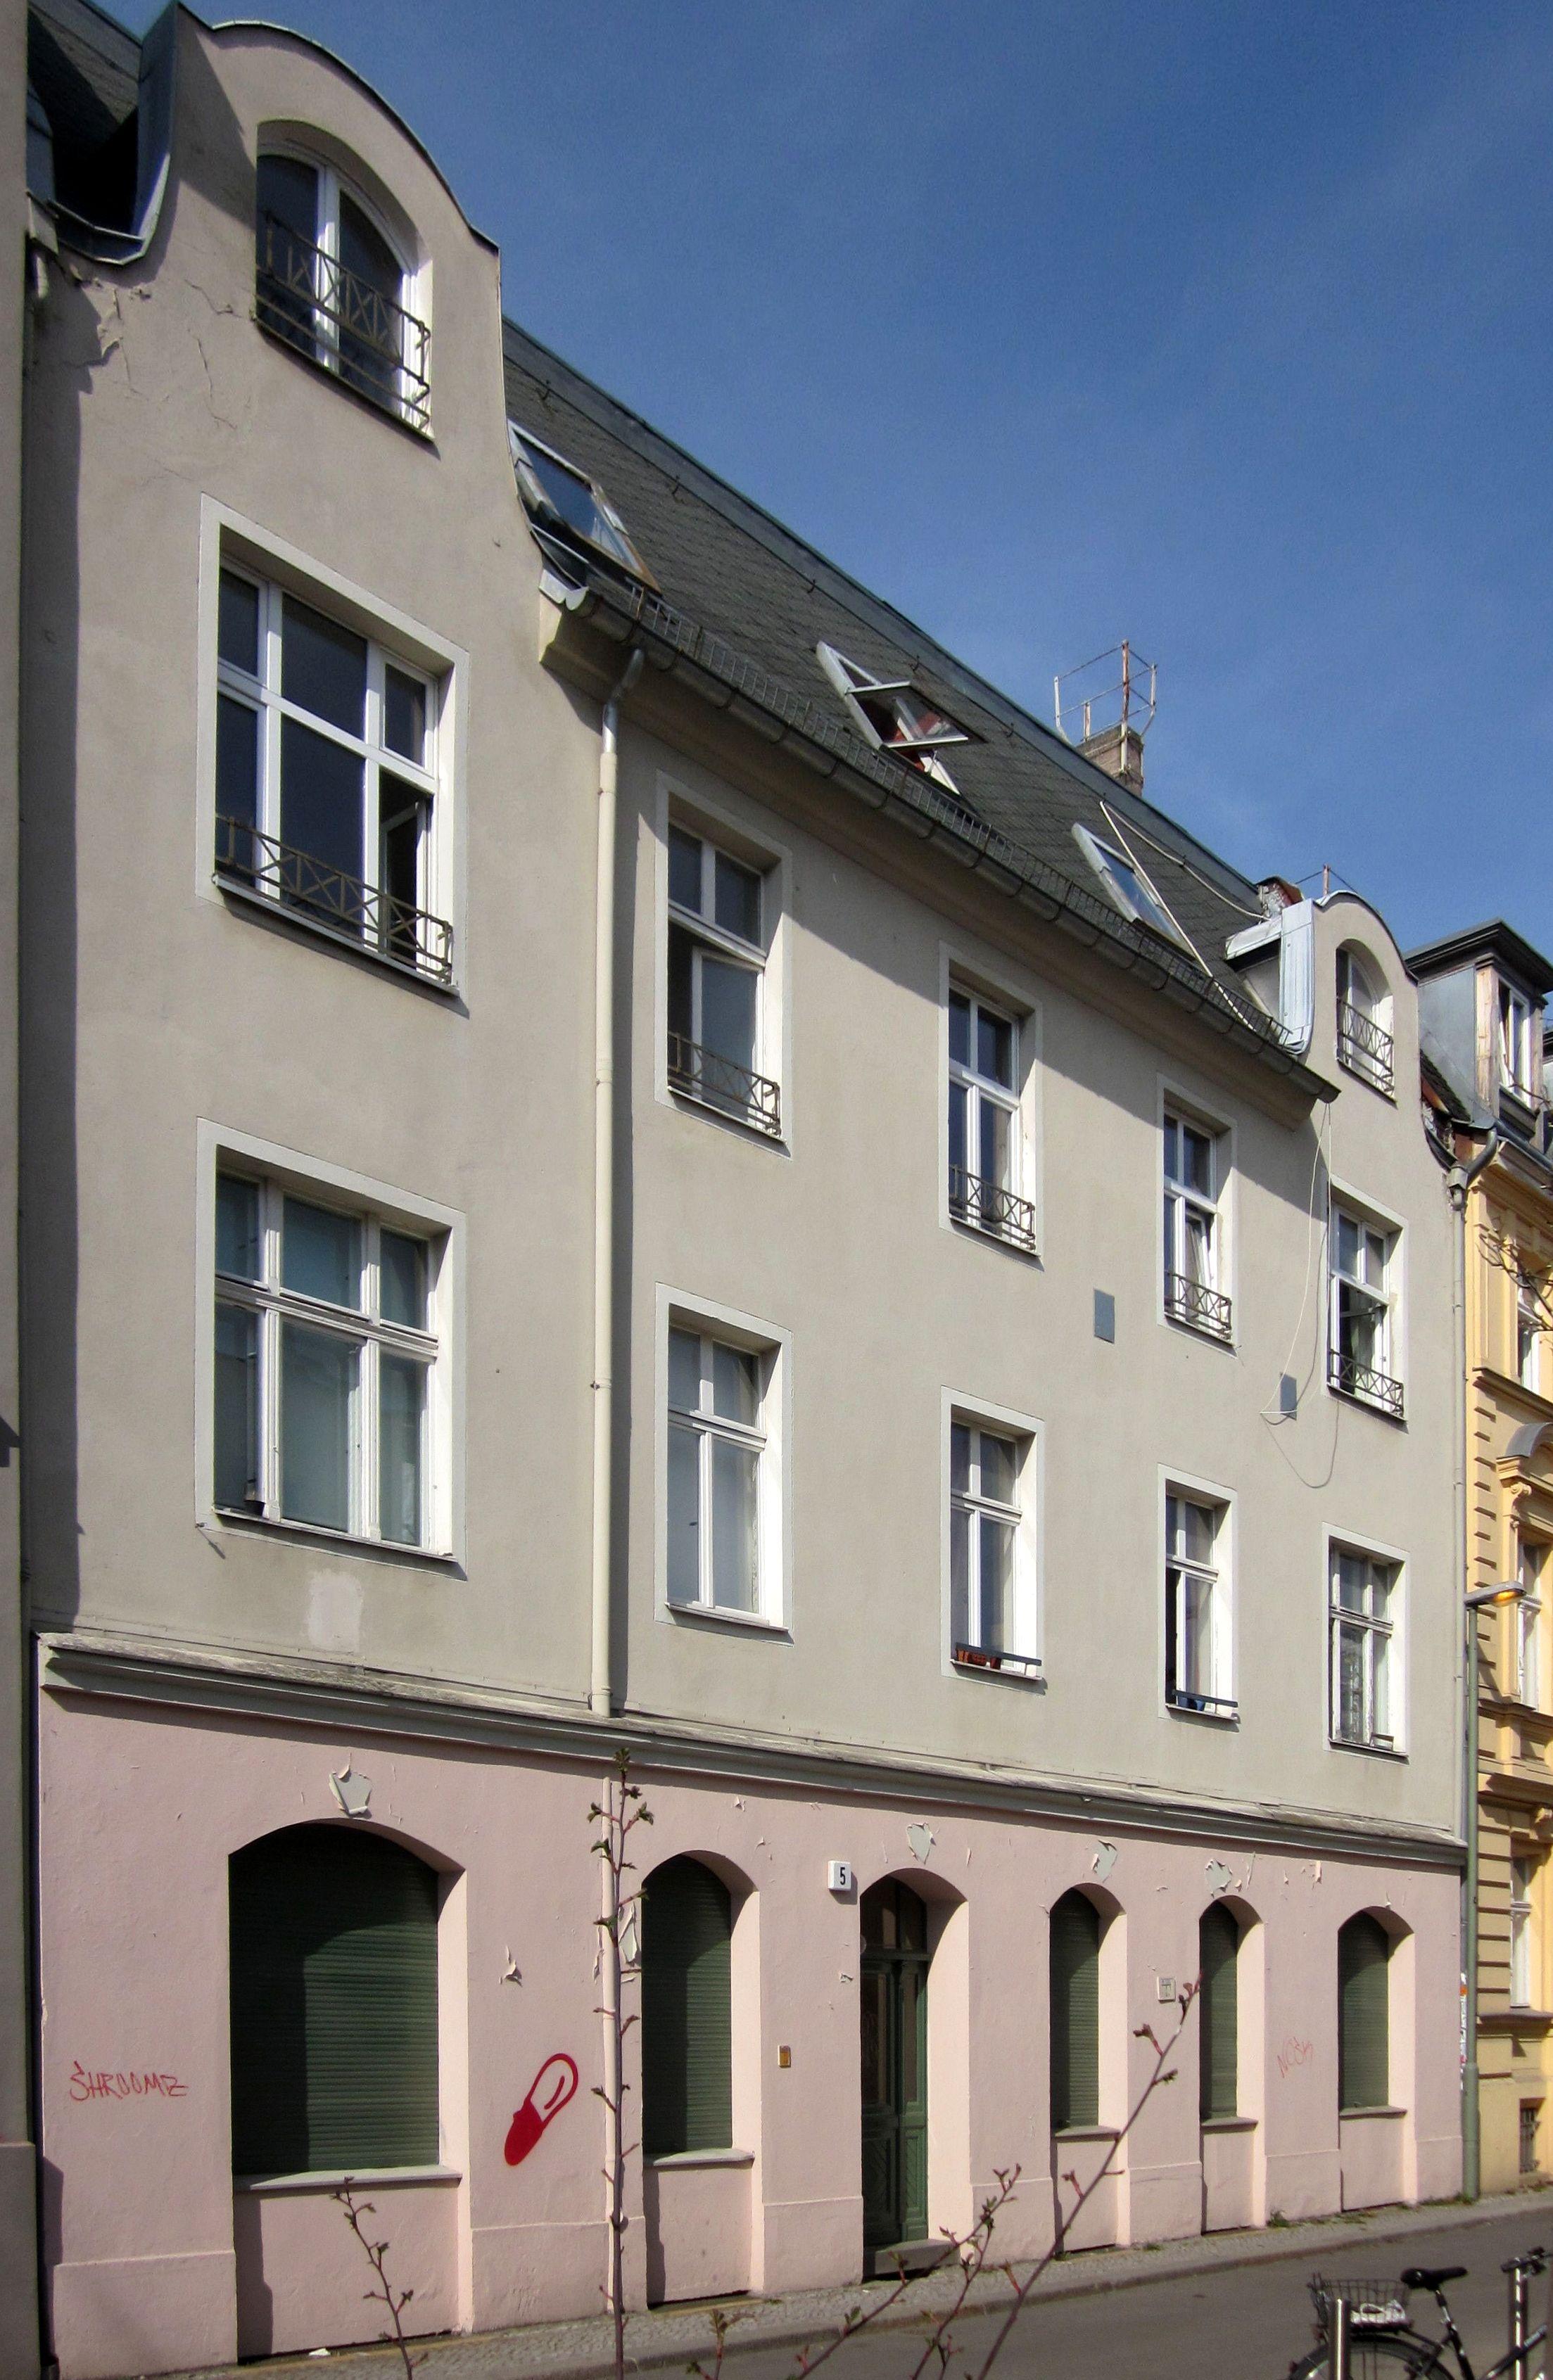 file berlin mitte kleine auguststrasse 5 wikimedia commons. Black Bedroom Furniture Sets. Home Design Ideas